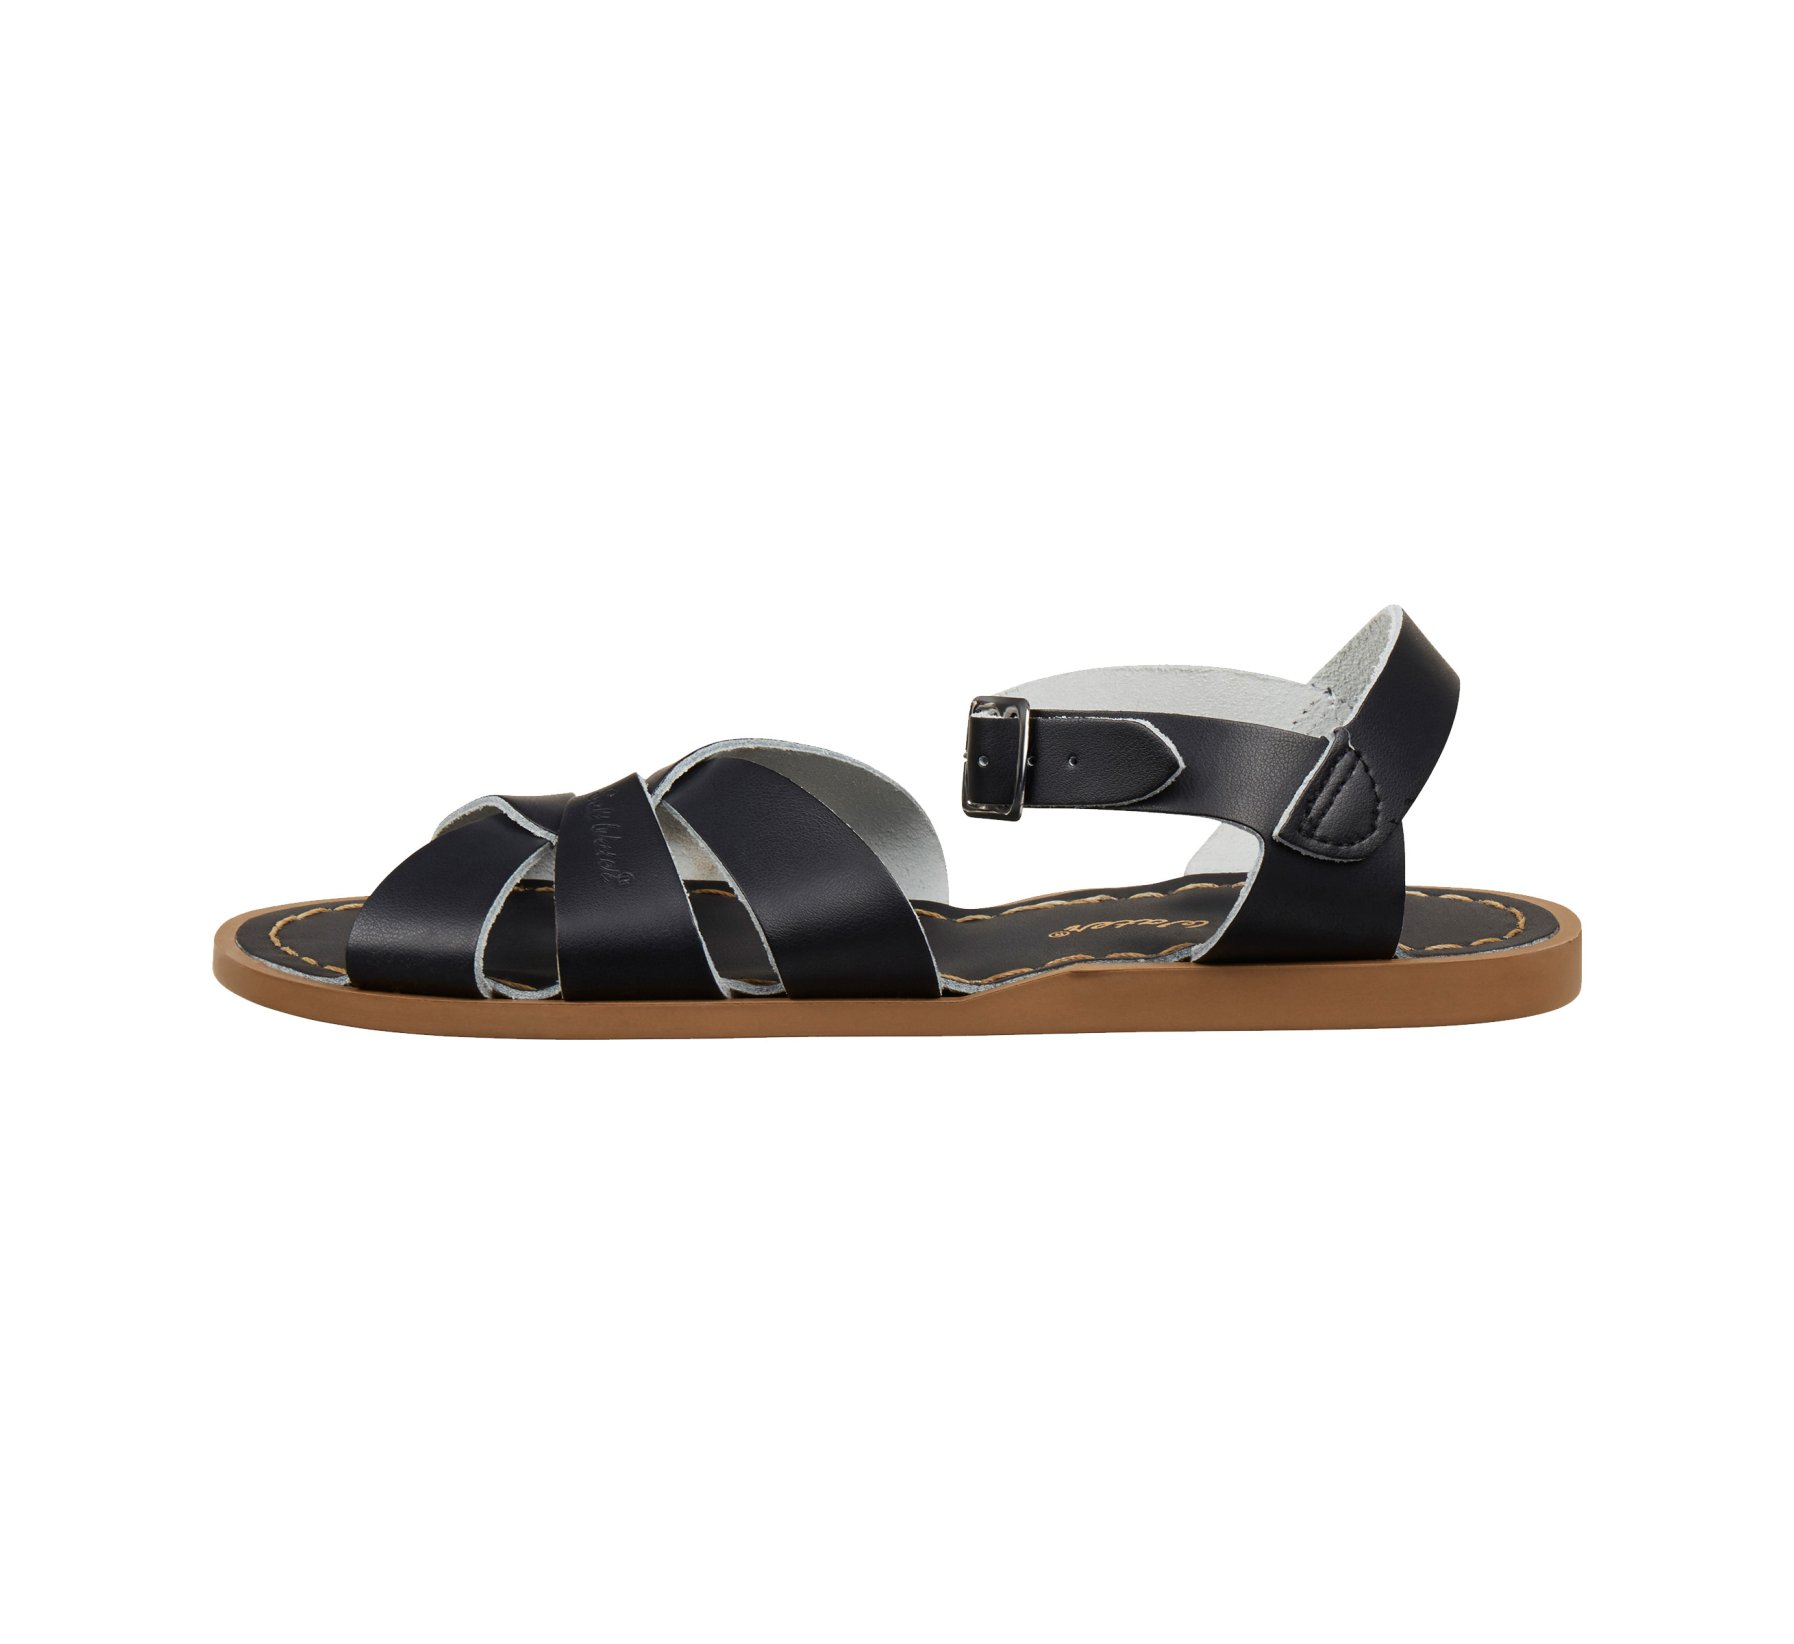 Original Hitam - Salt Water Sandals